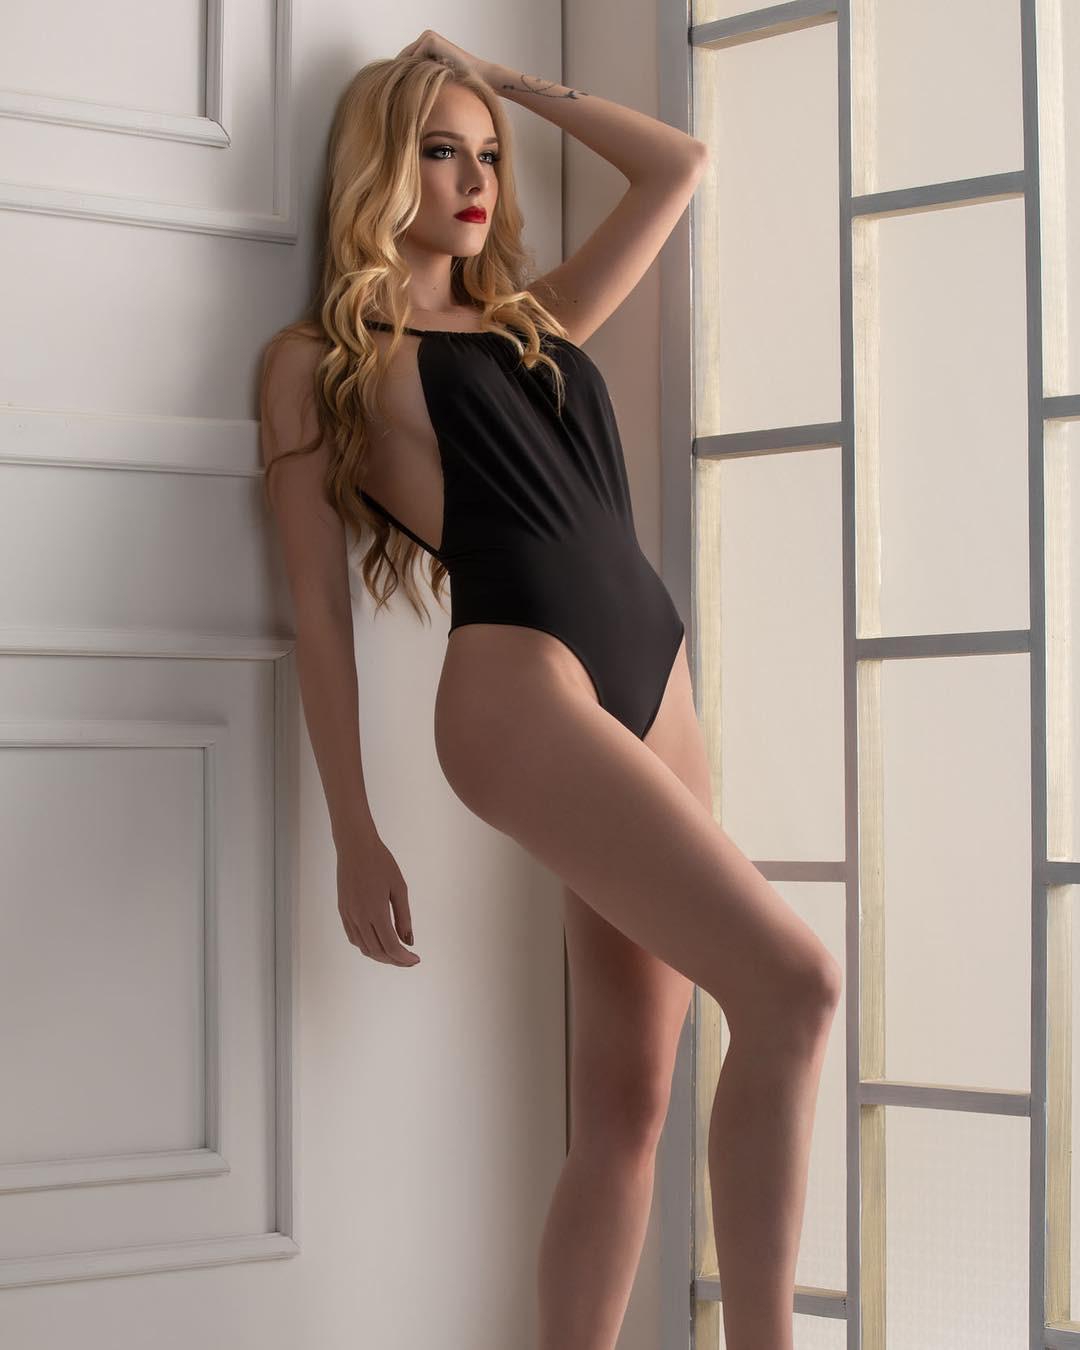 elizama aguilar, top 5 de miss brasil mundo 2019. - Página 6 Bdfgpi10